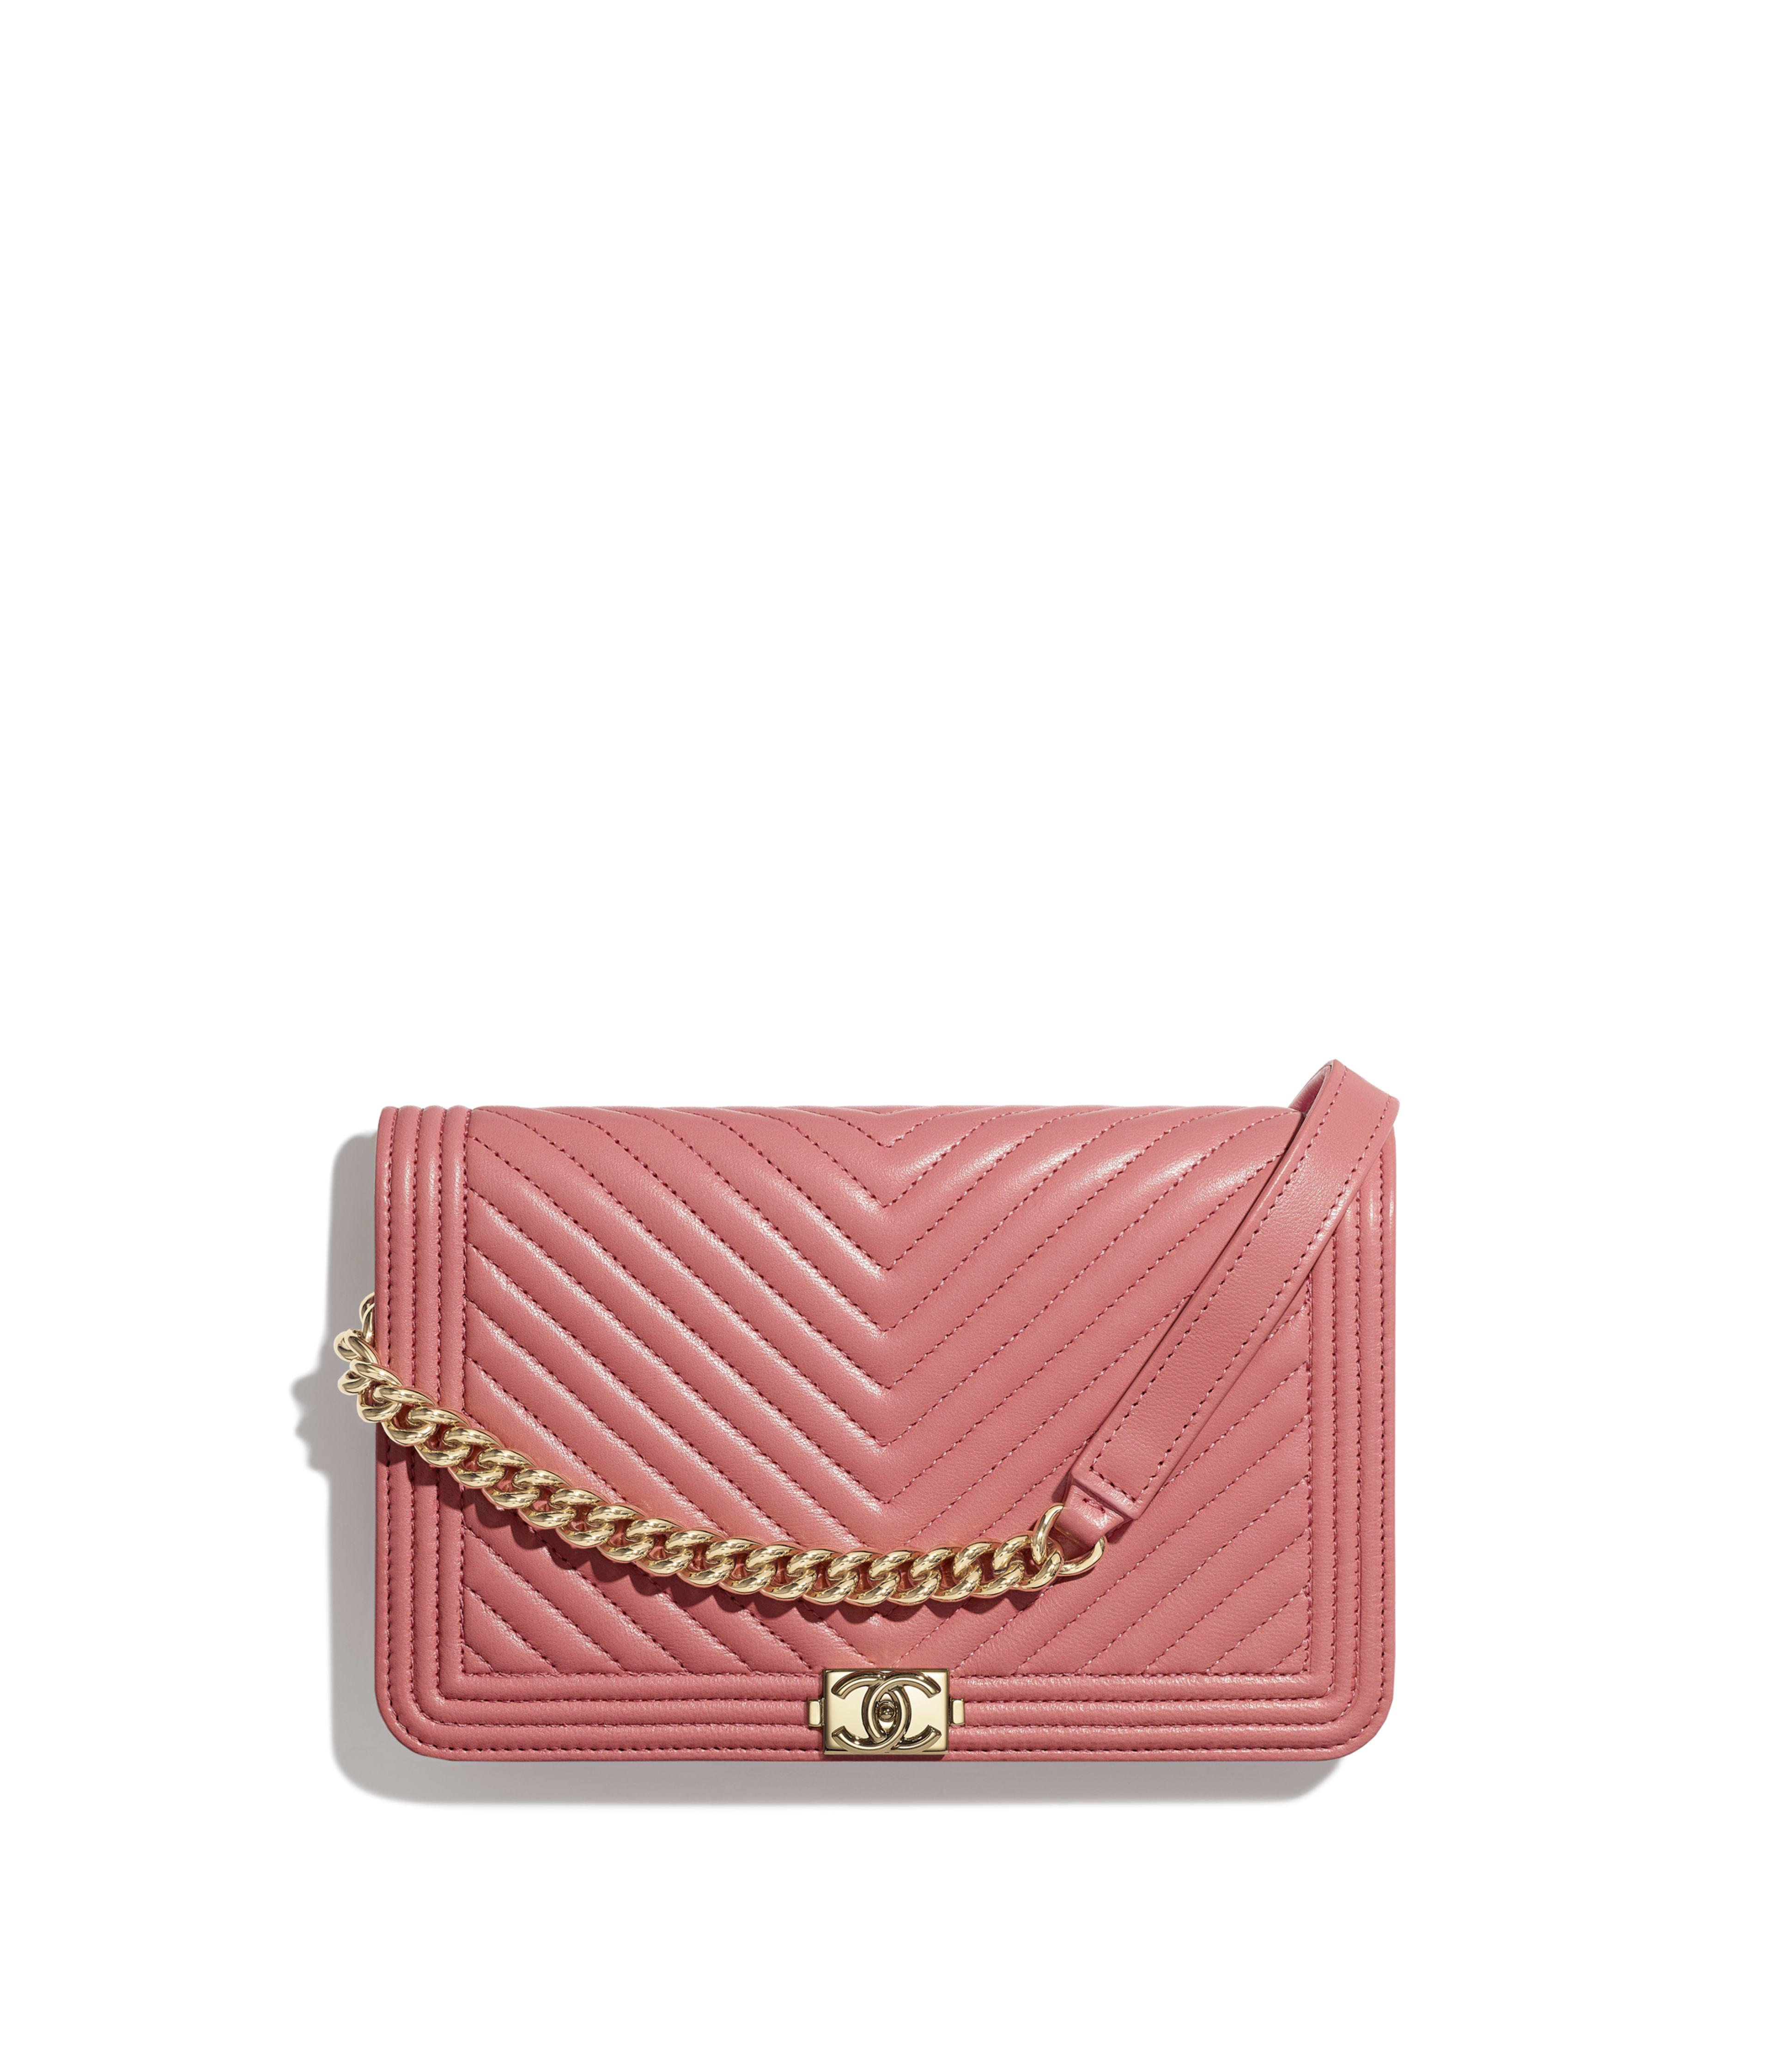 0f9980bd7087a3 BOY CHANEL Wallet on Chain Lambskin & Gold-Tone Metal, Pink Ref.  A81969B00635N4704